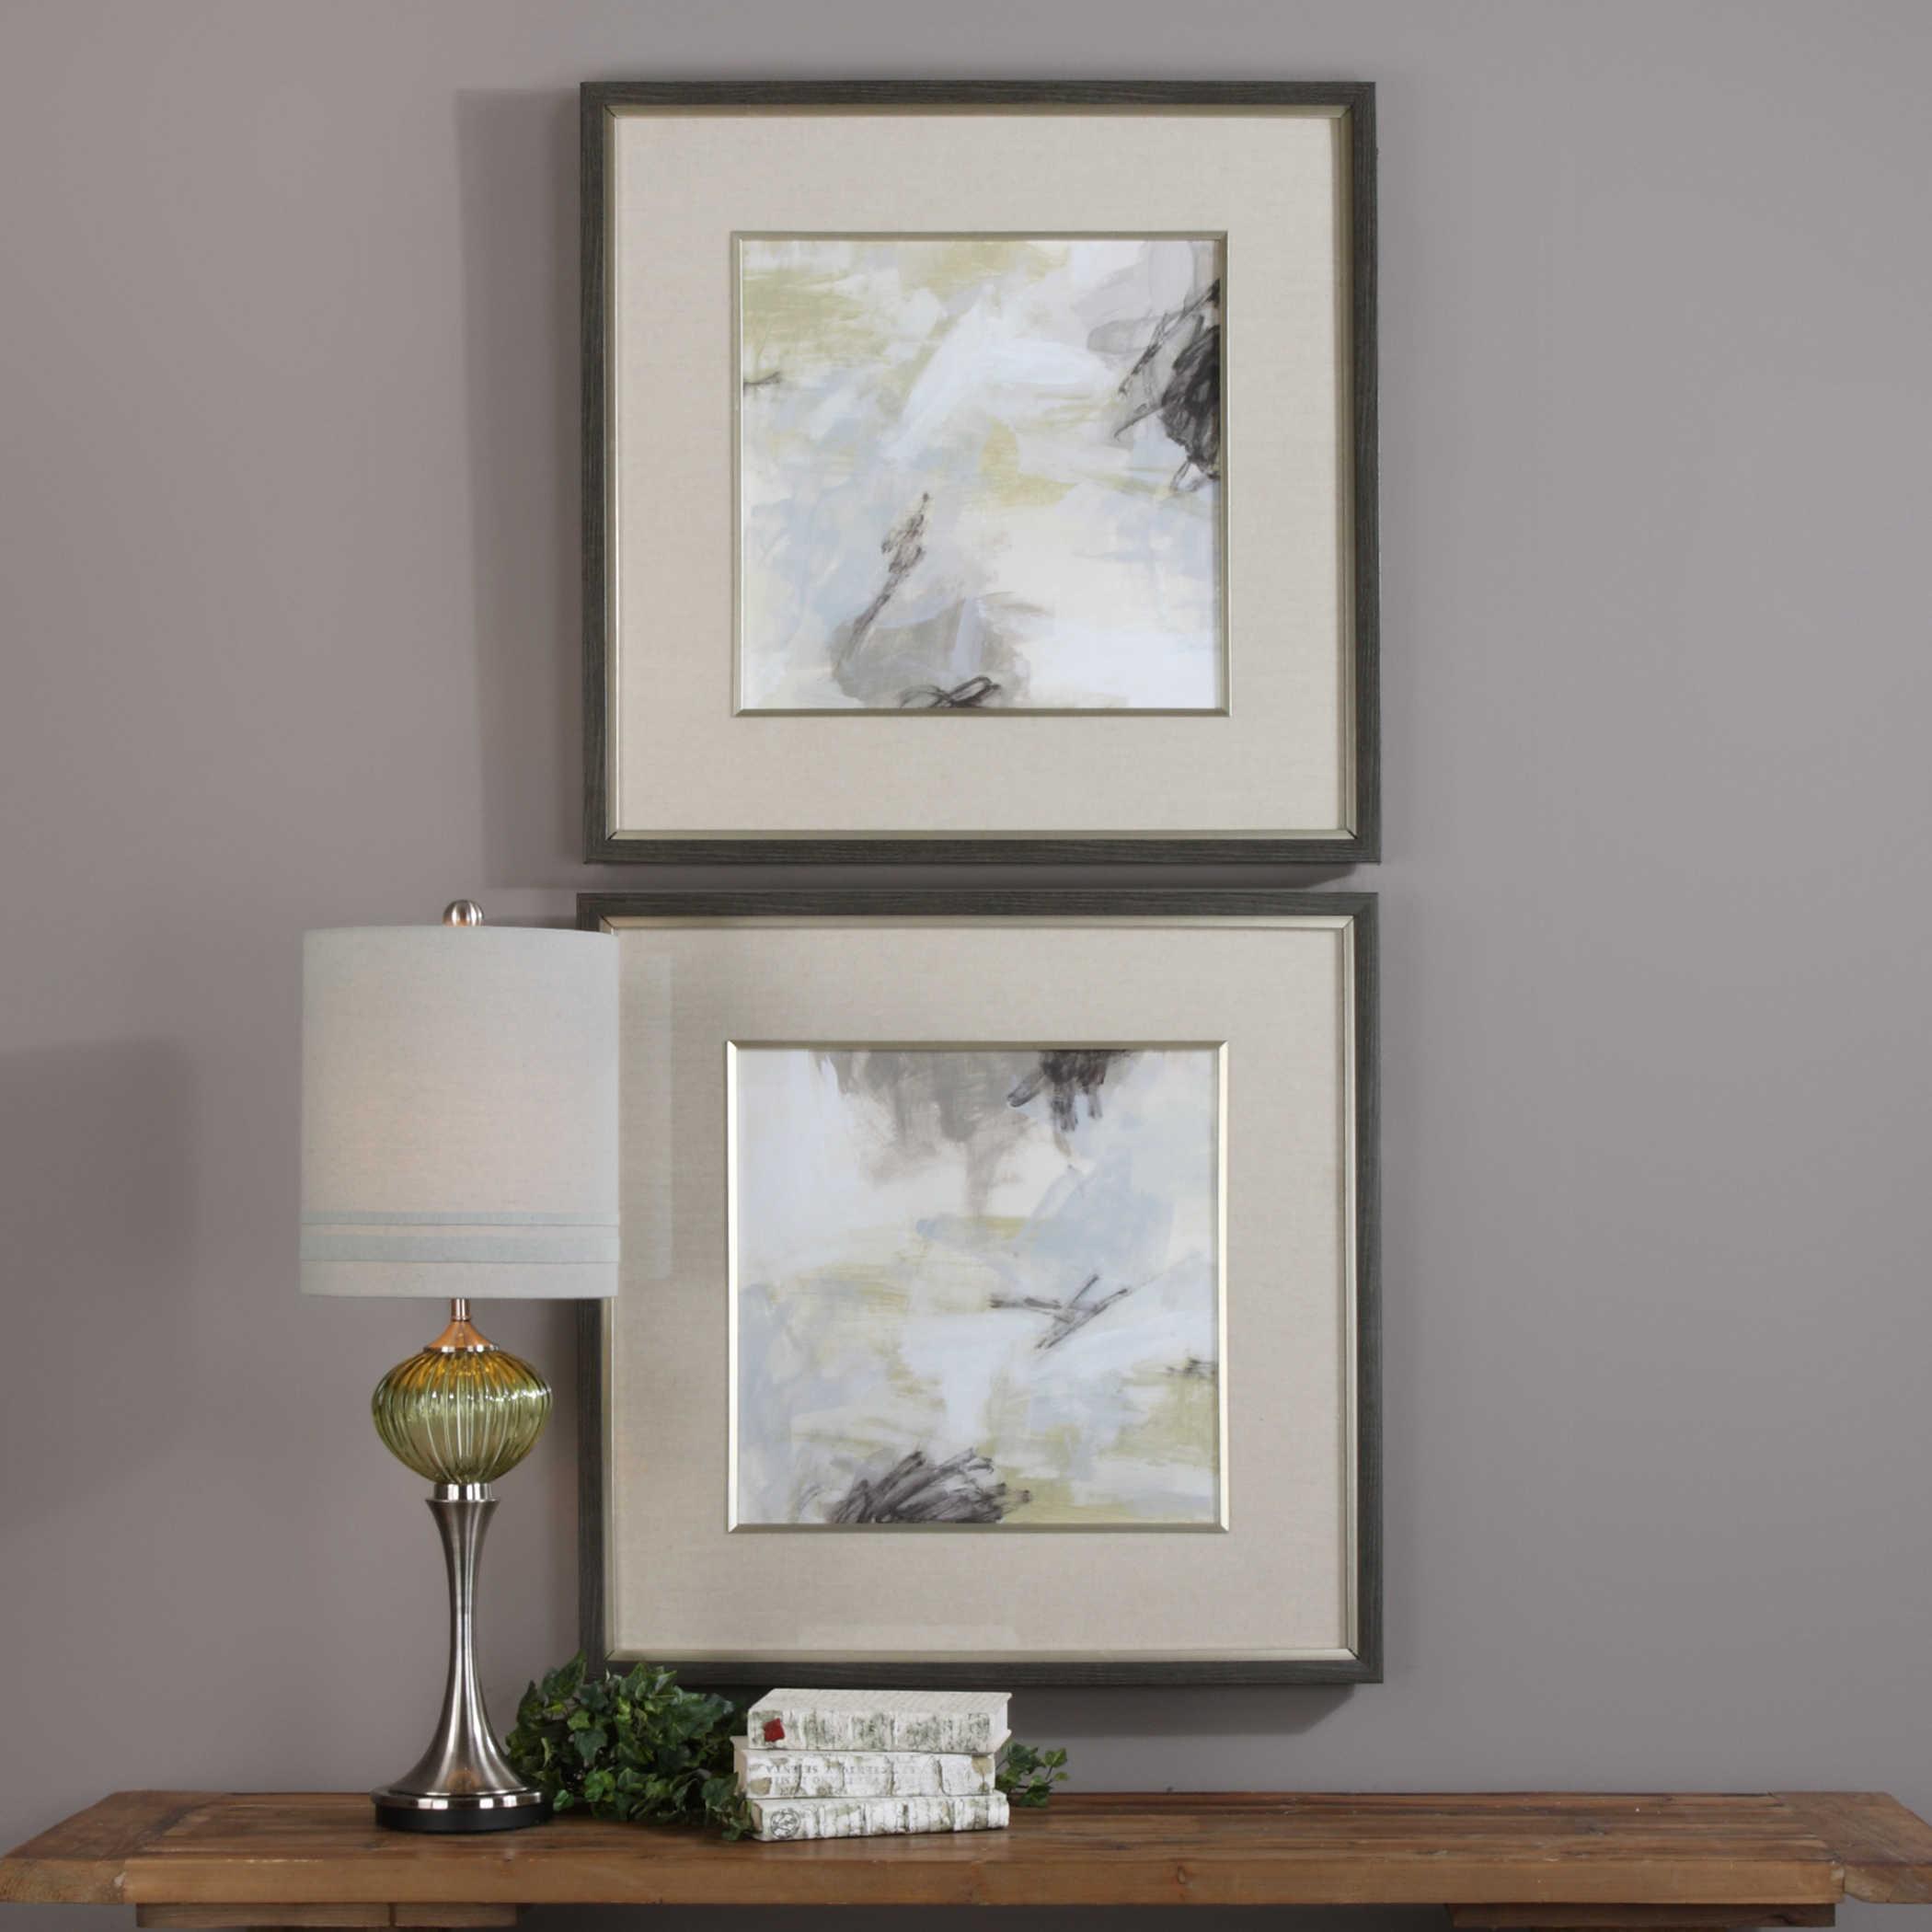 Abstract Vistas Framed Prints S 2